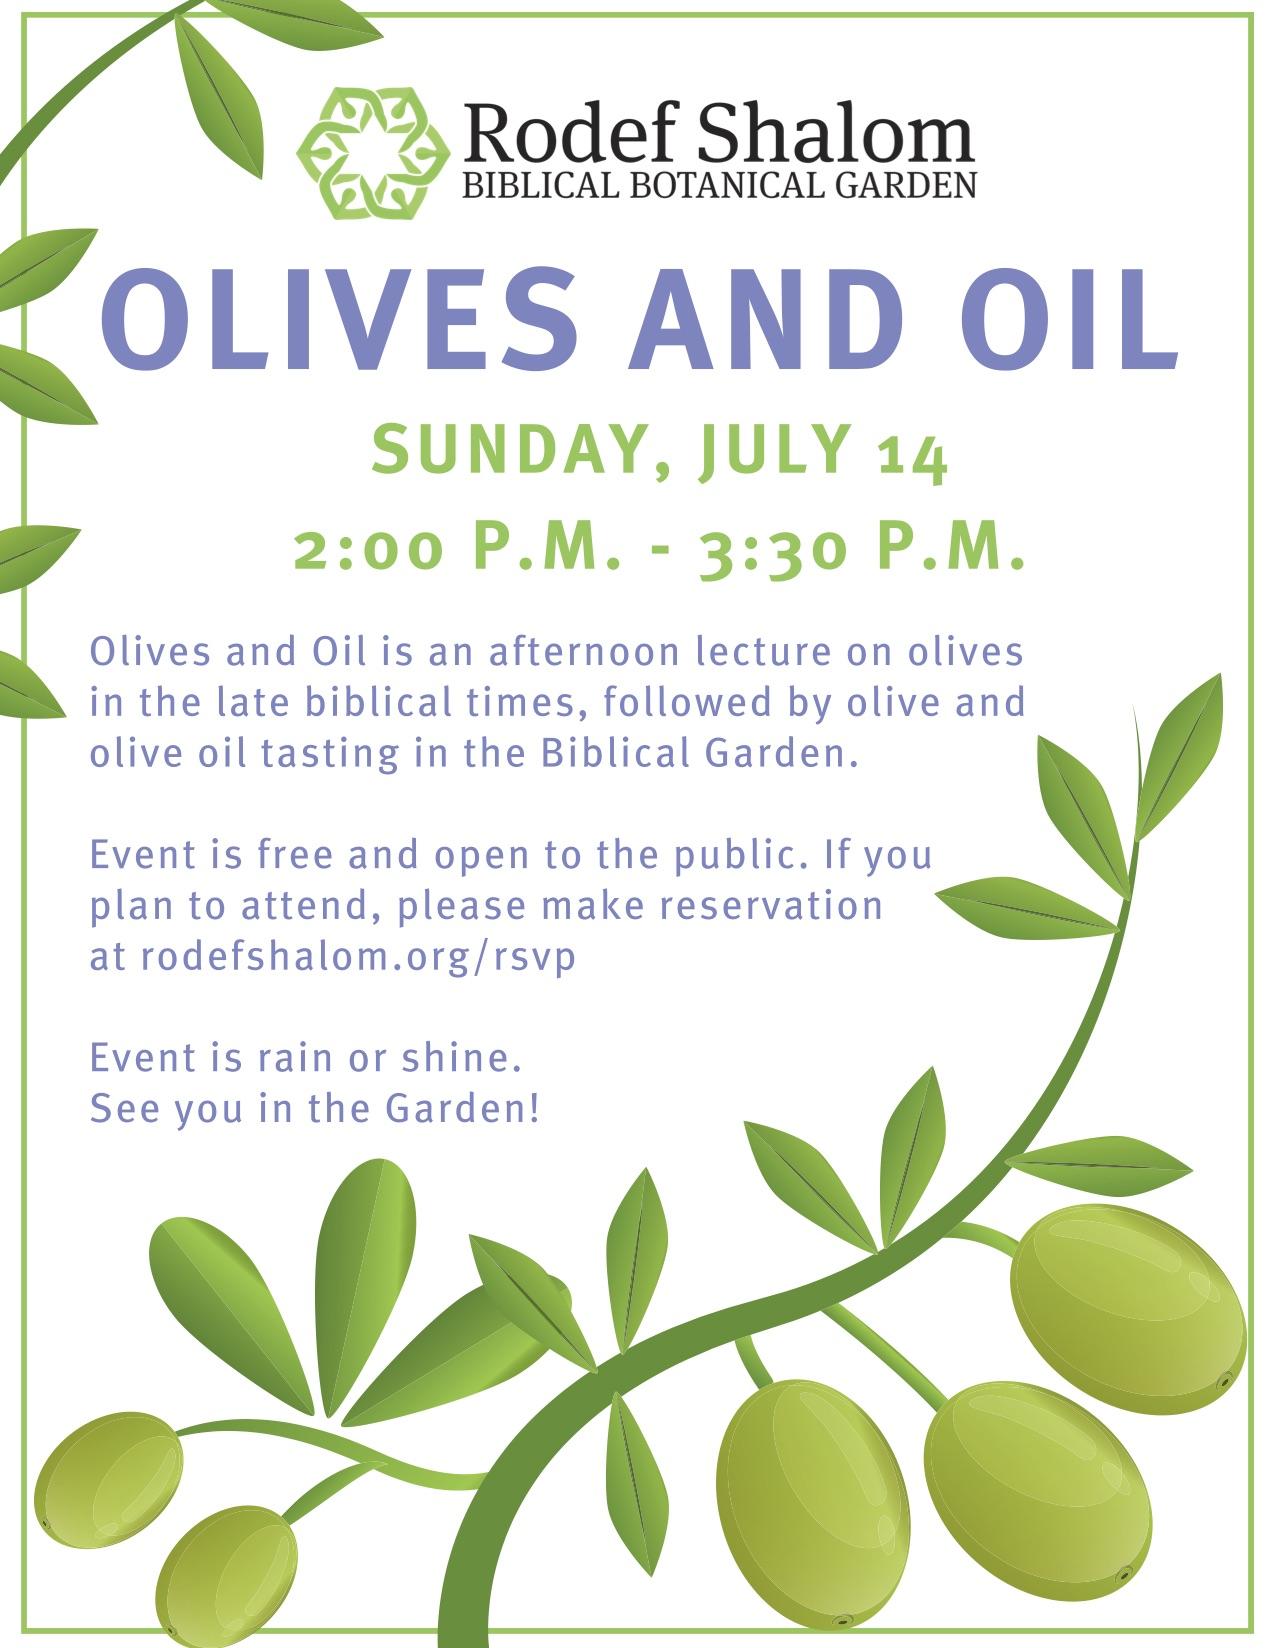 Olives and Oil Flyer (1).jpg